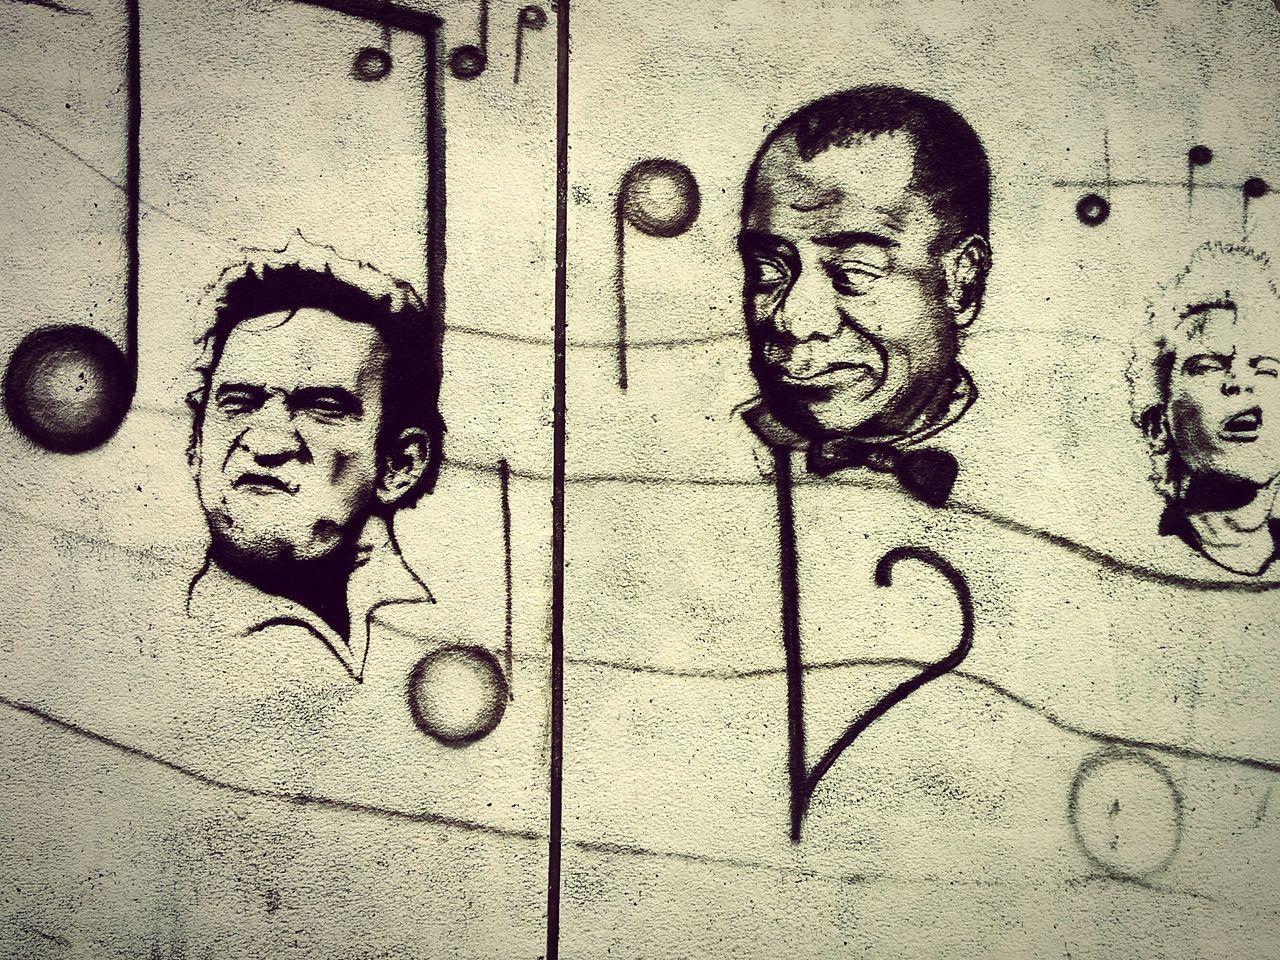 Outside of Doors Club in Constanta, Romania Rock N Roll Johnnycash Billyidol Louis Armstrong Constanta Streetart/graffiti Street Art Wall Art Rock